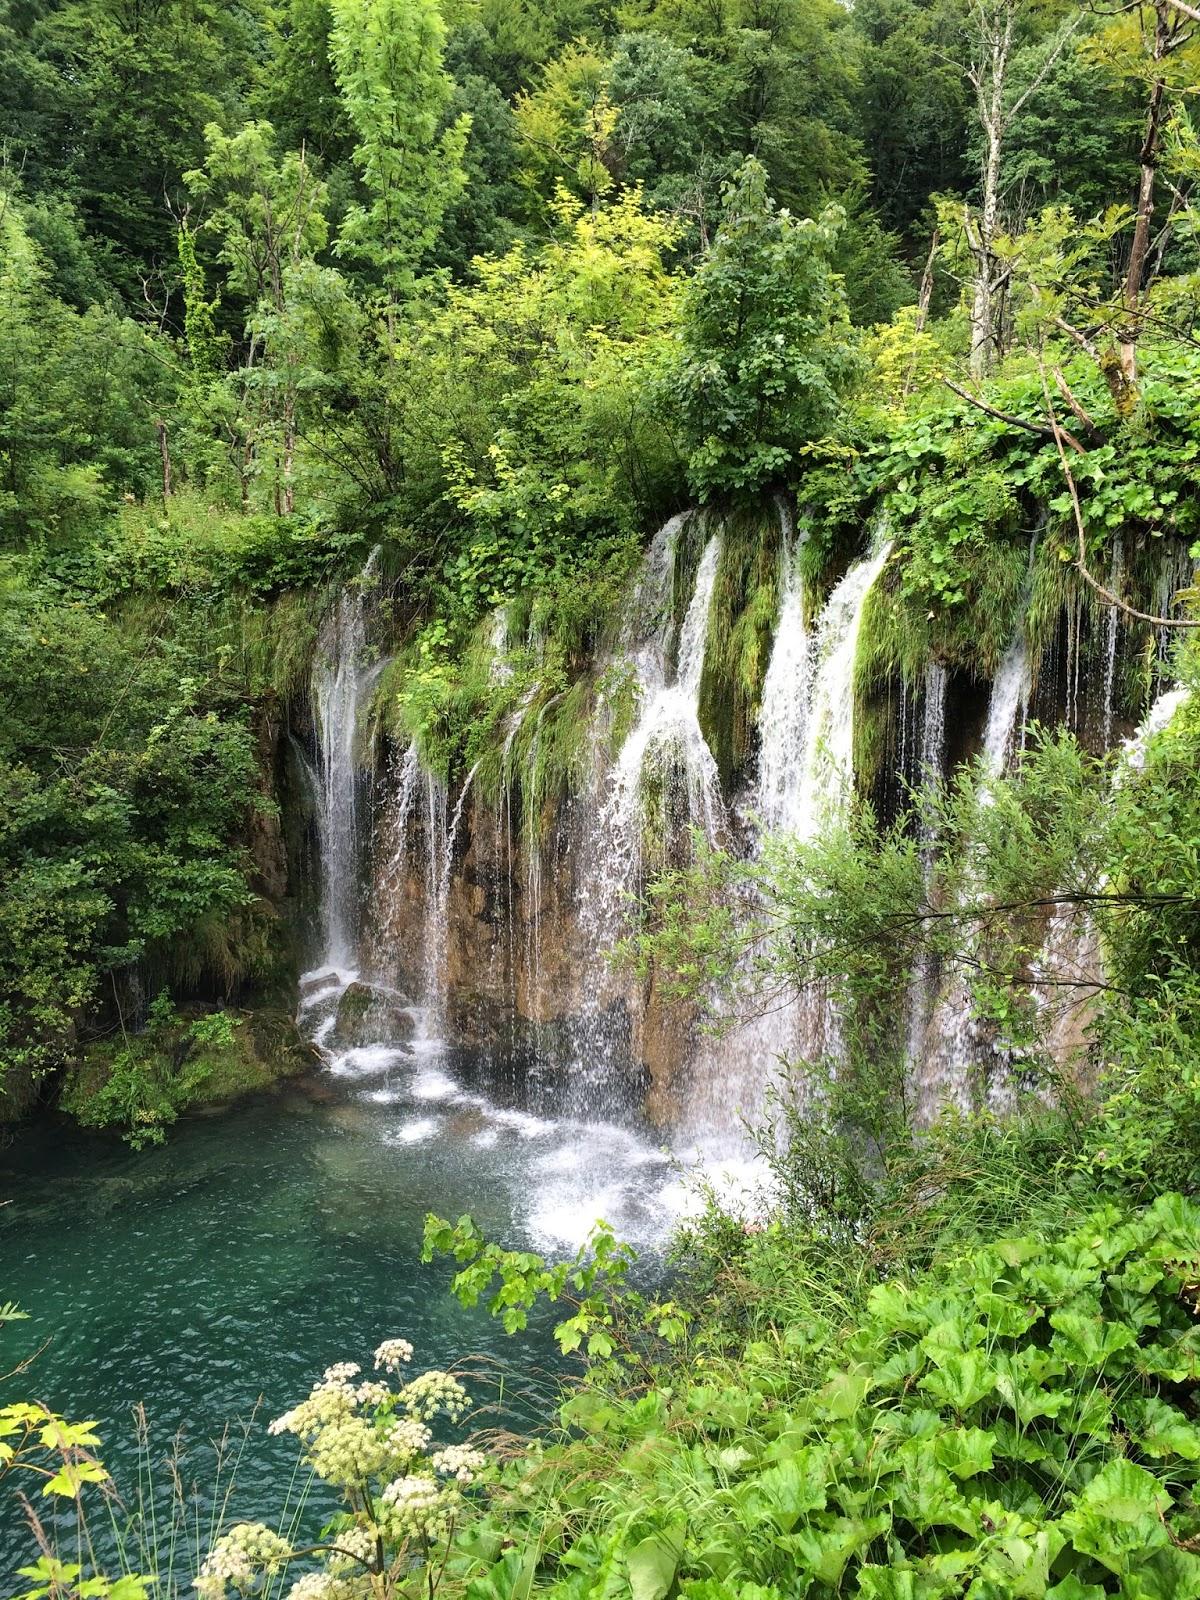 Plitvice Lakes National Park: Keltie Leanne Designs' Blog: Croatia Photo Diary: Plitvice